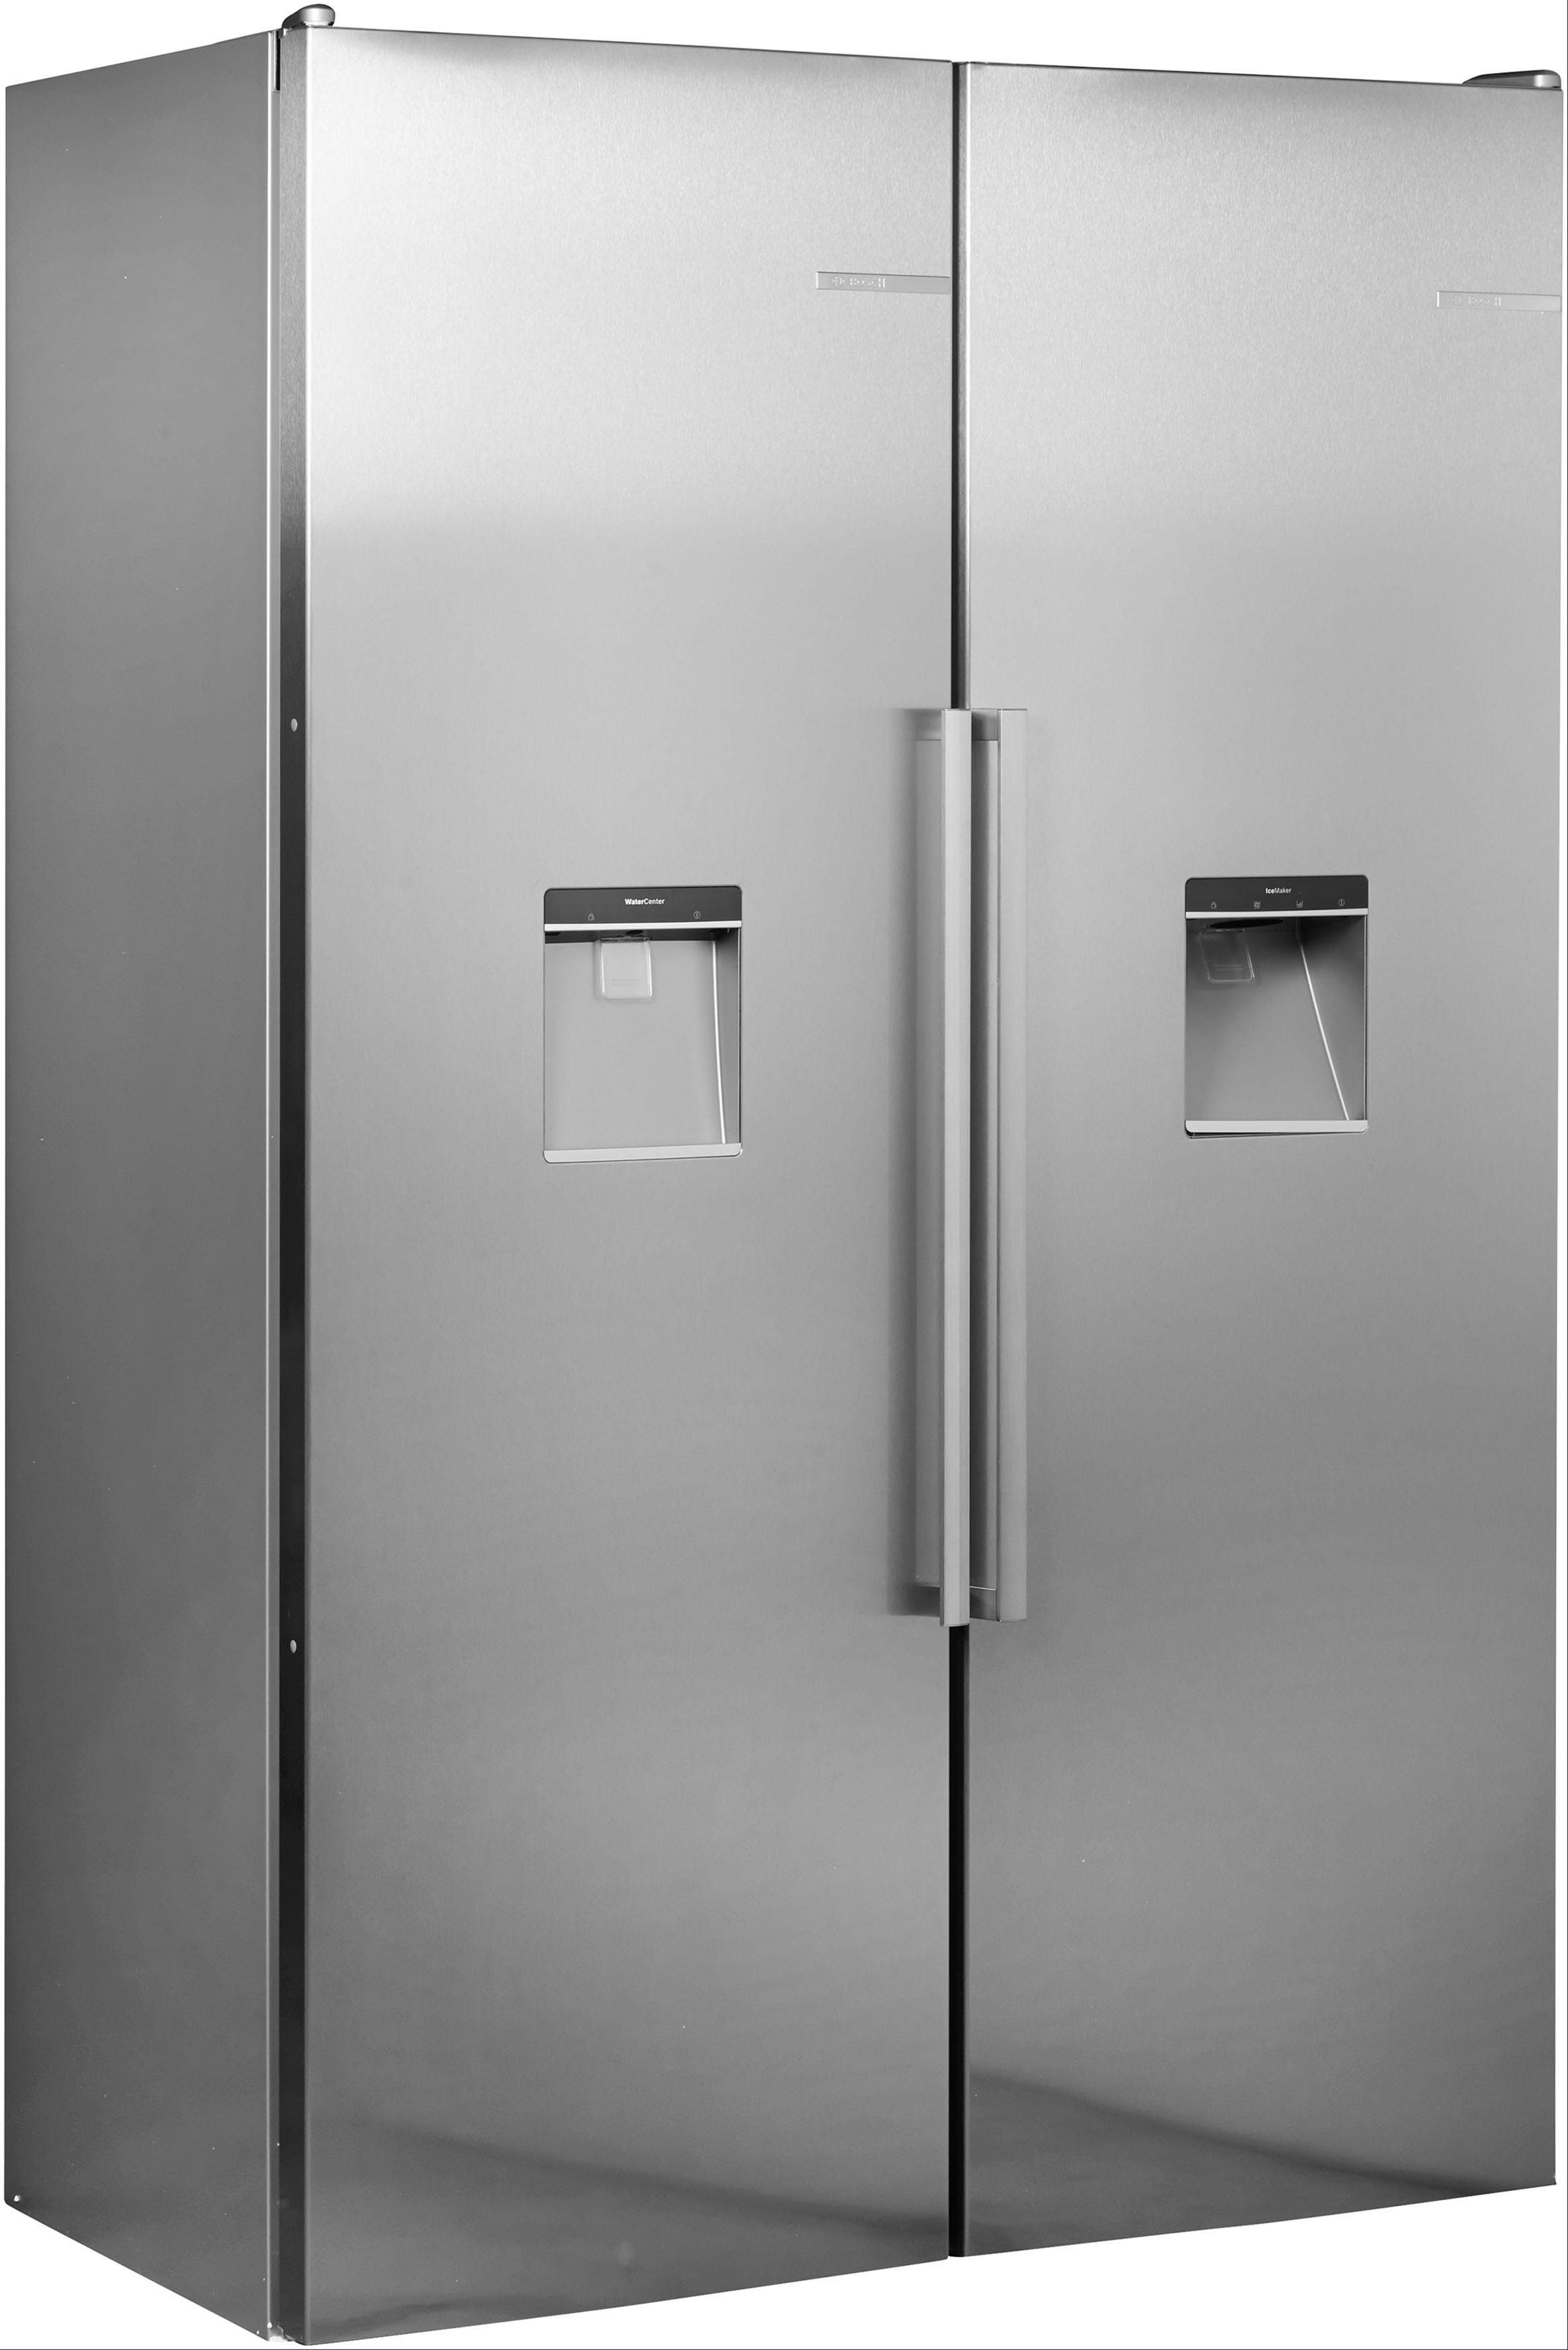 BOSCH Side-by-Side Serie 6 KAD95BI2P, 187 cm hoch, 120 cm breit